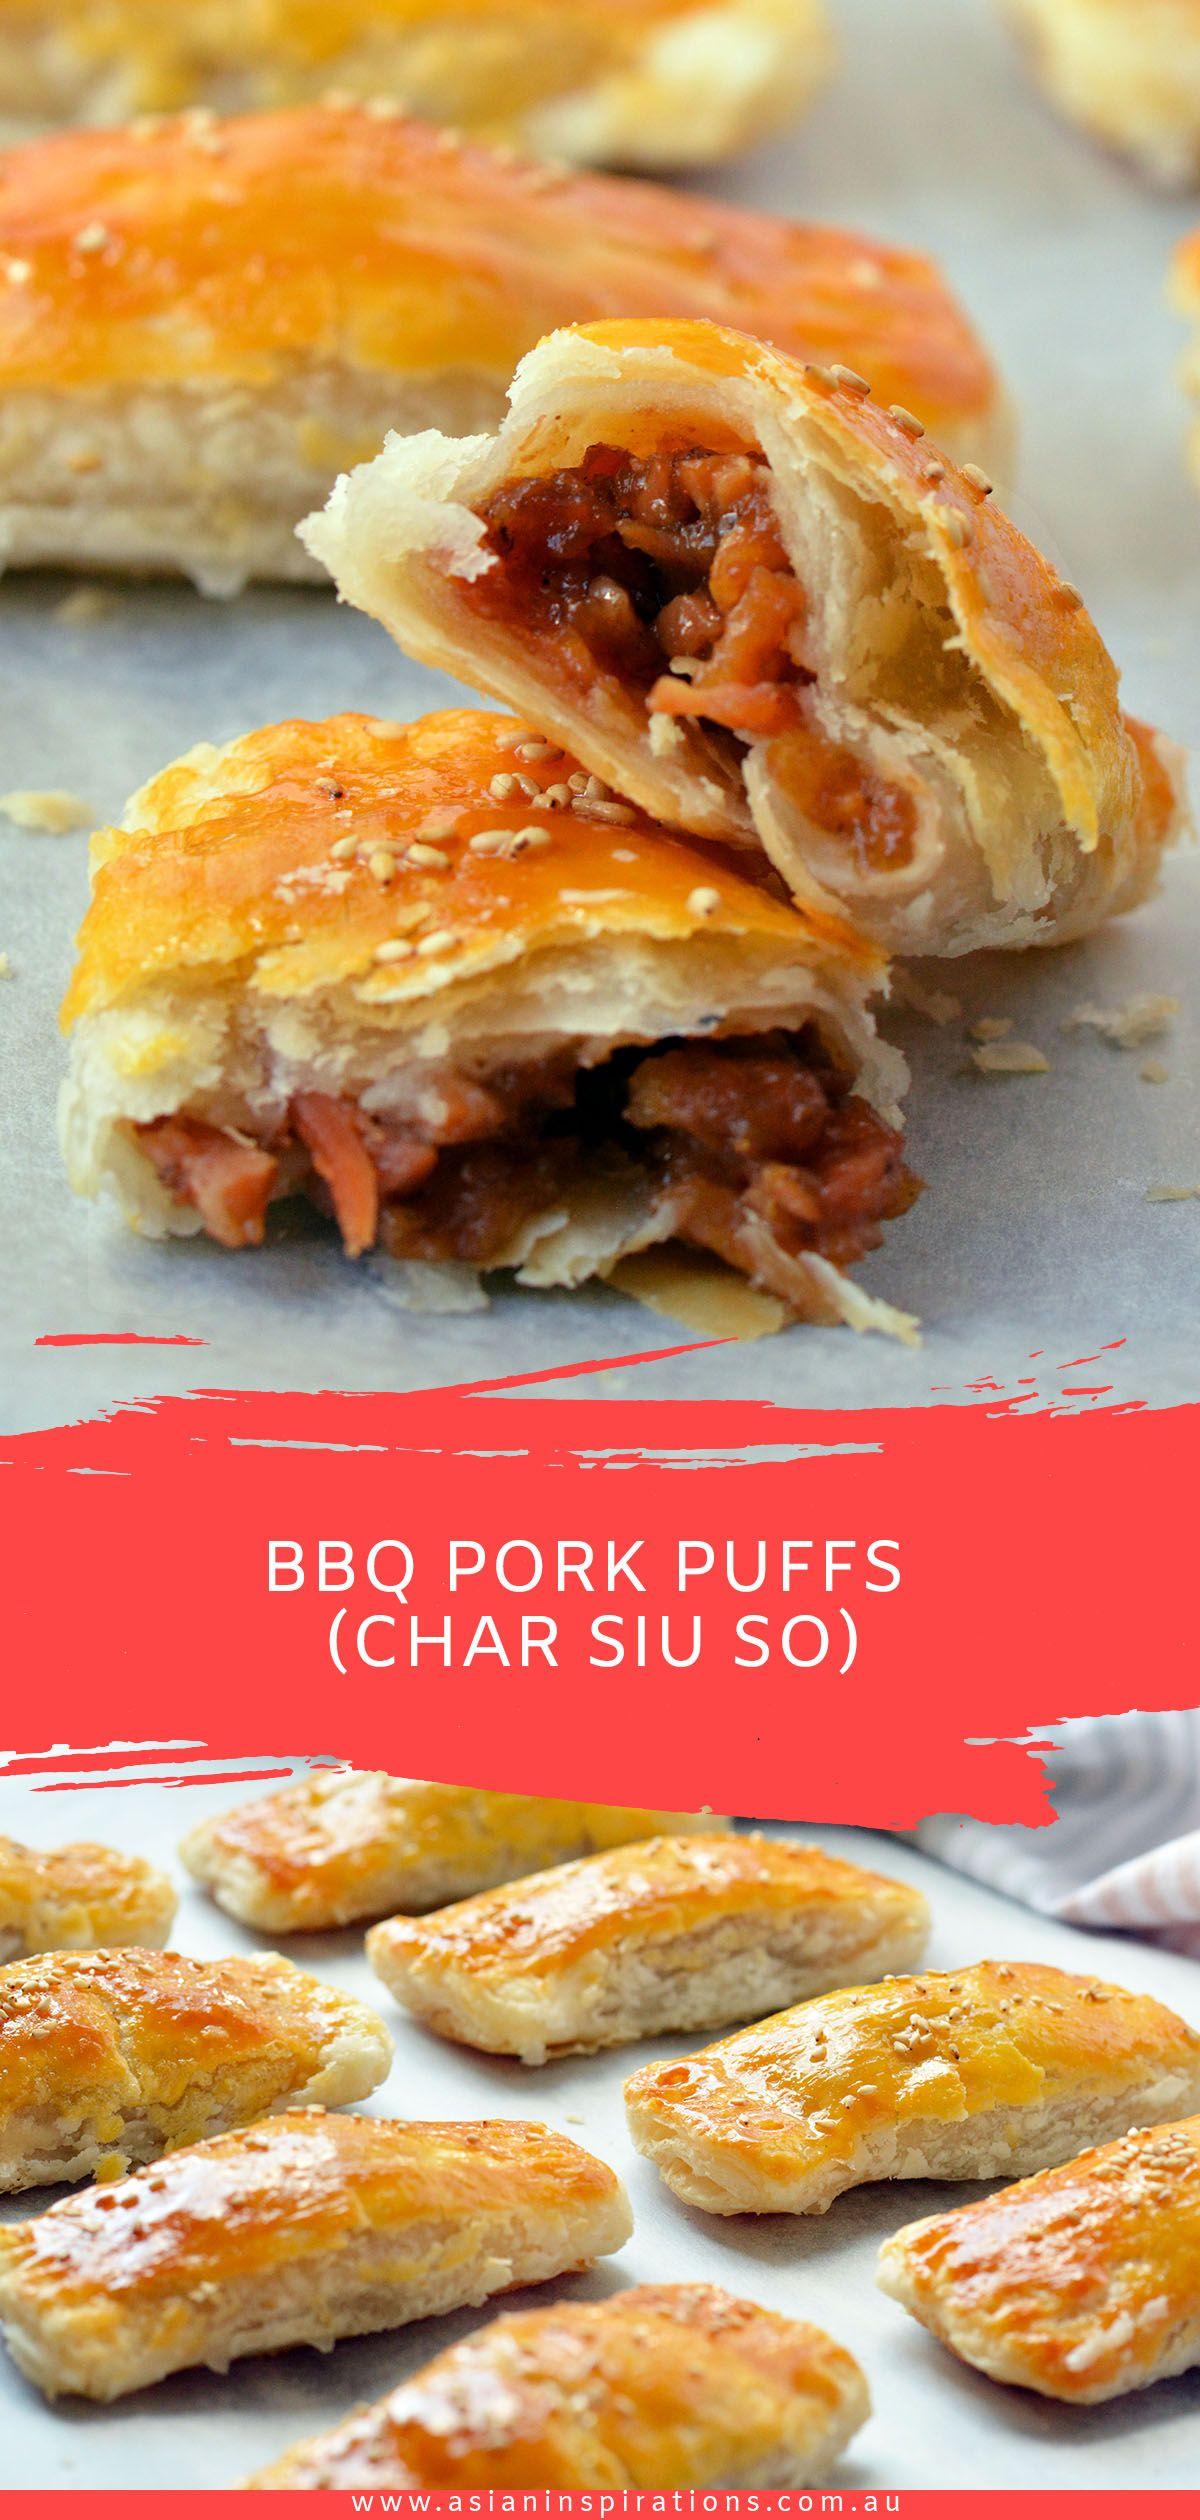 Bbq pork puffs char siu so asian inspirations recipe